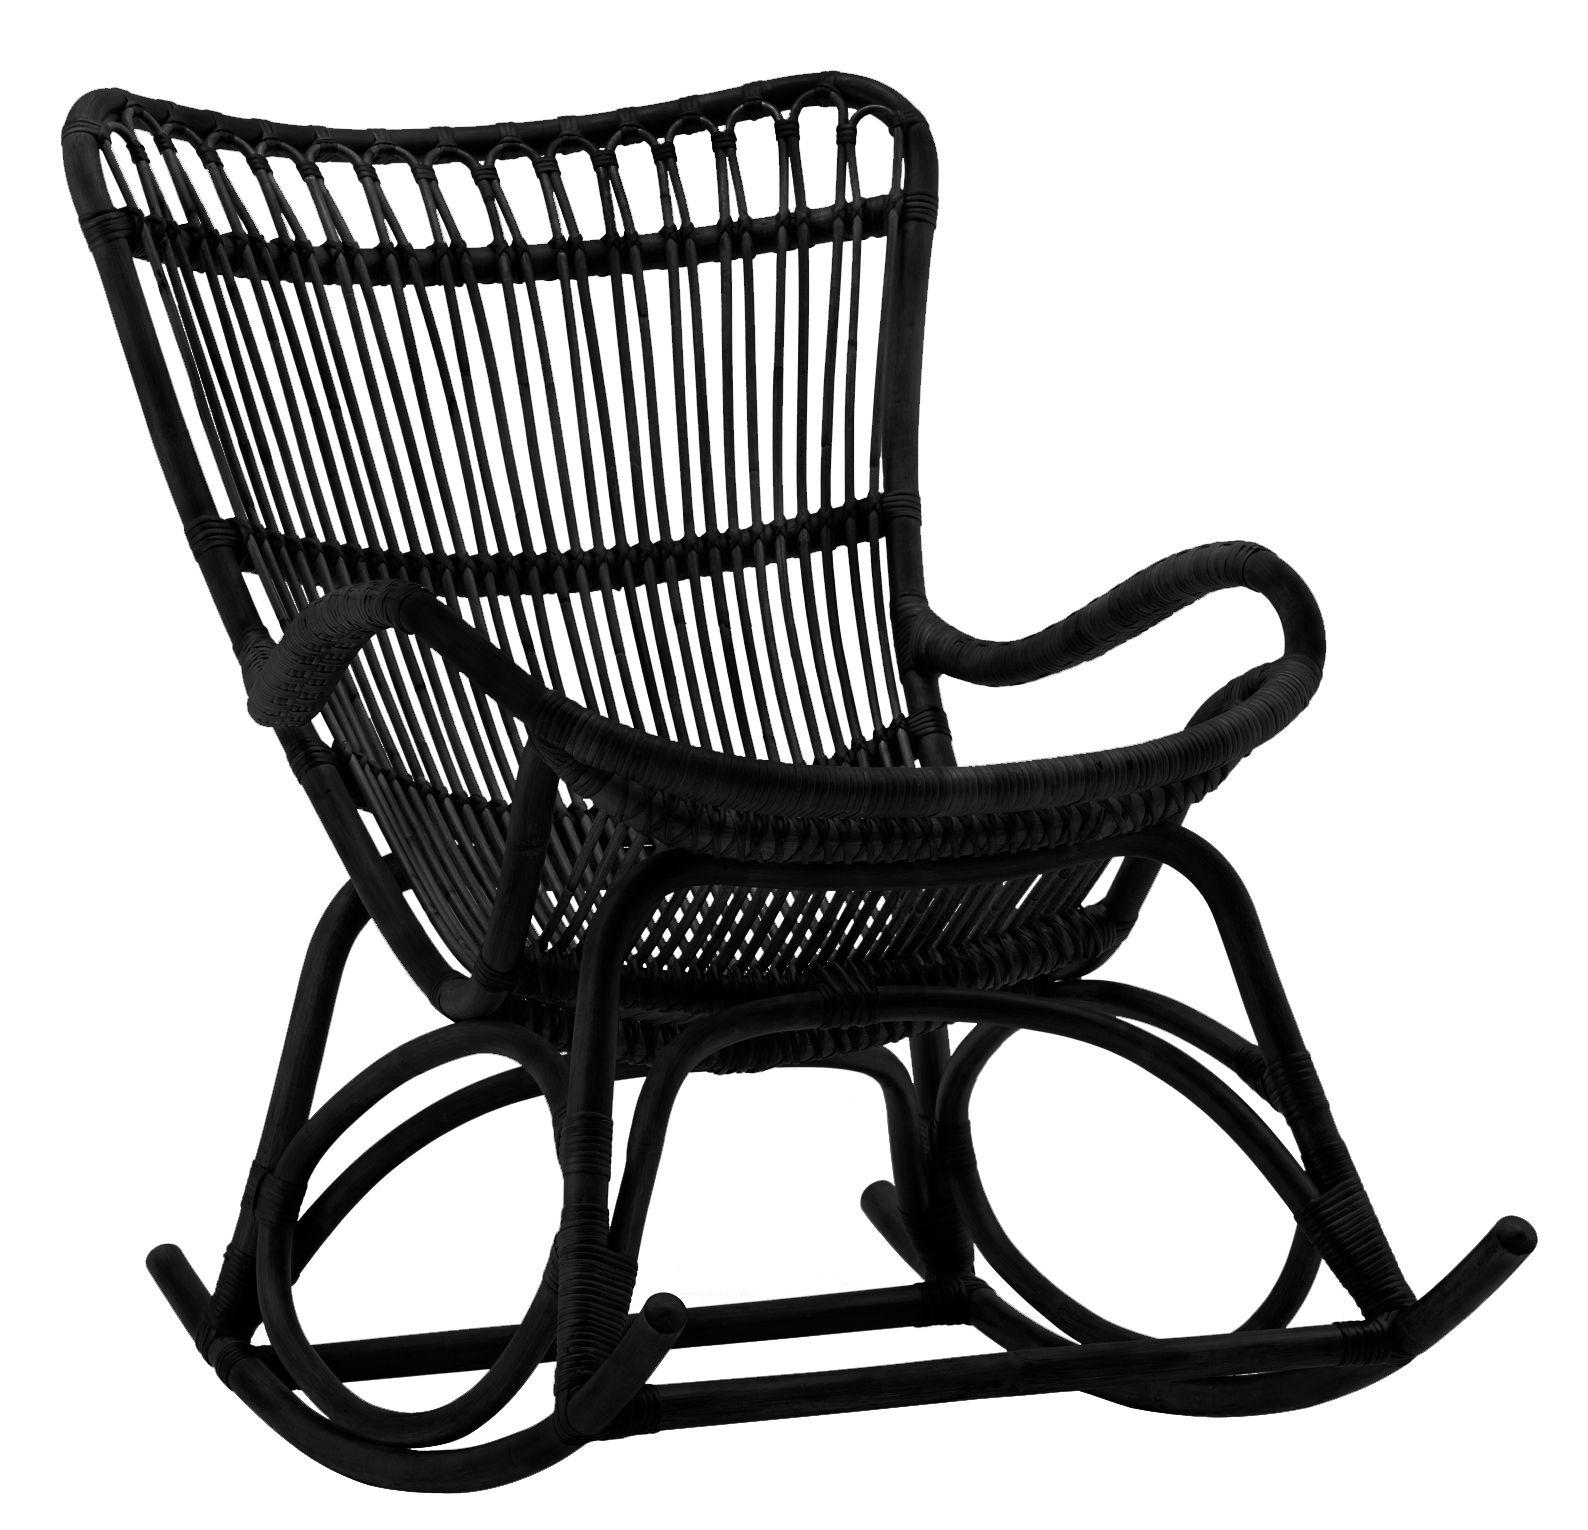 Möbel - Lounge Sessel - Monet Schaukelstuhl - Sika Design - Schwarz - Rattan